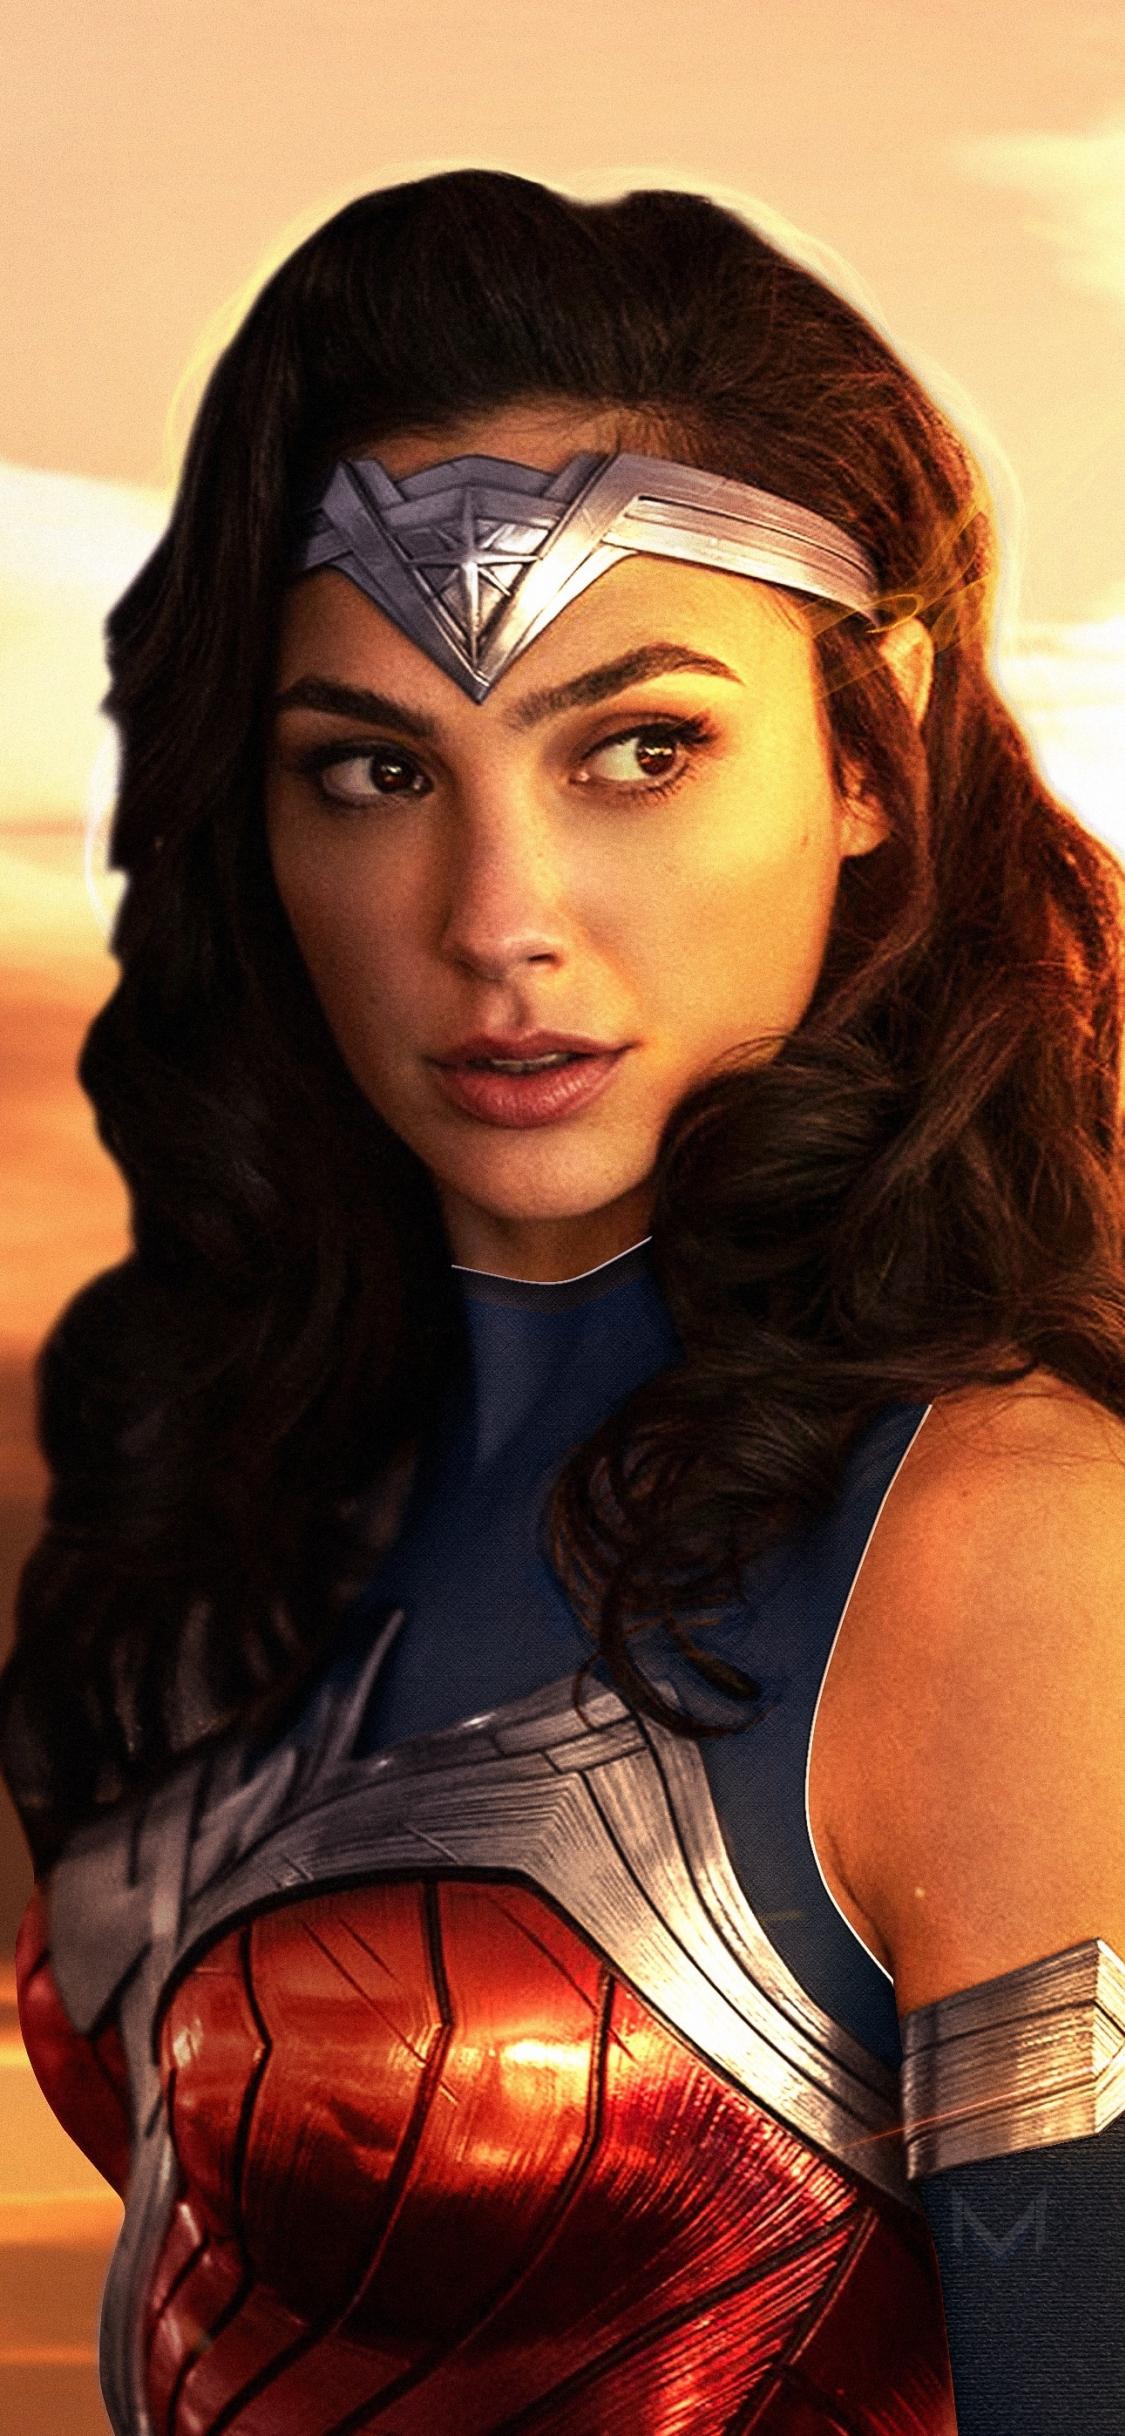 Wonder Woman 1984 2019 Movie Art 1125x2436 Wallpaper